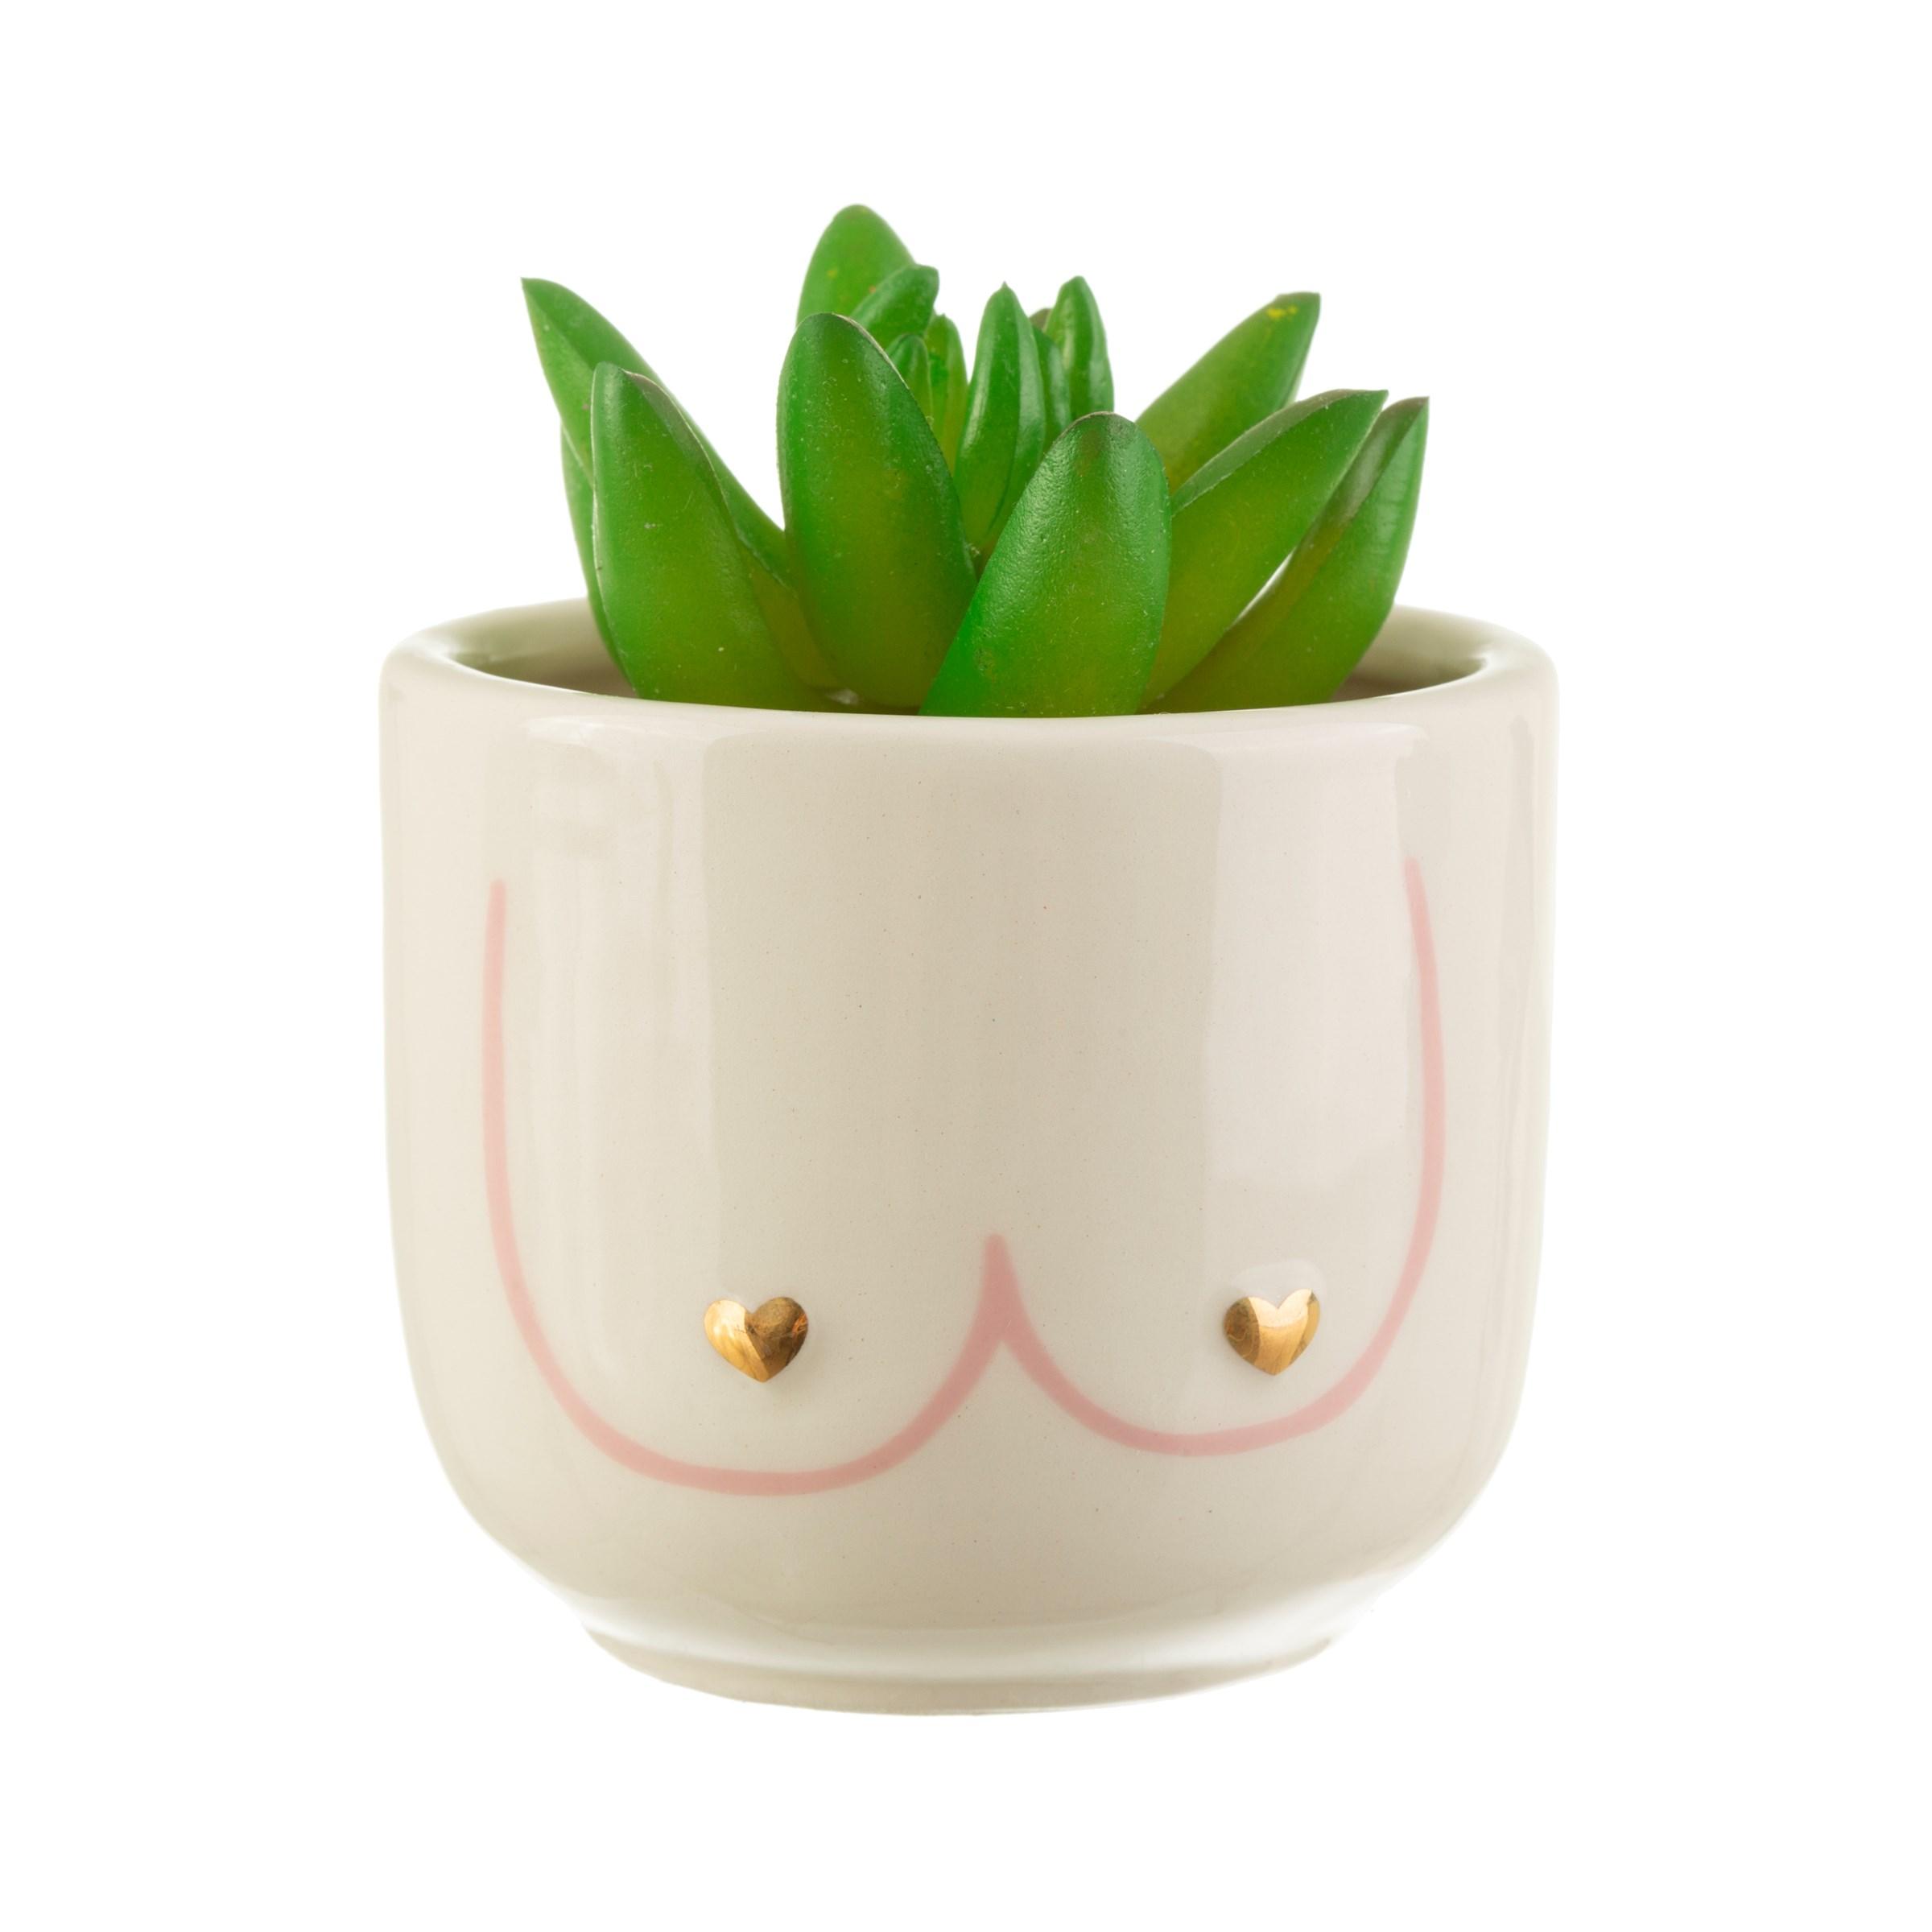 Sass Belle mini planter bloempot Girl Power boobies